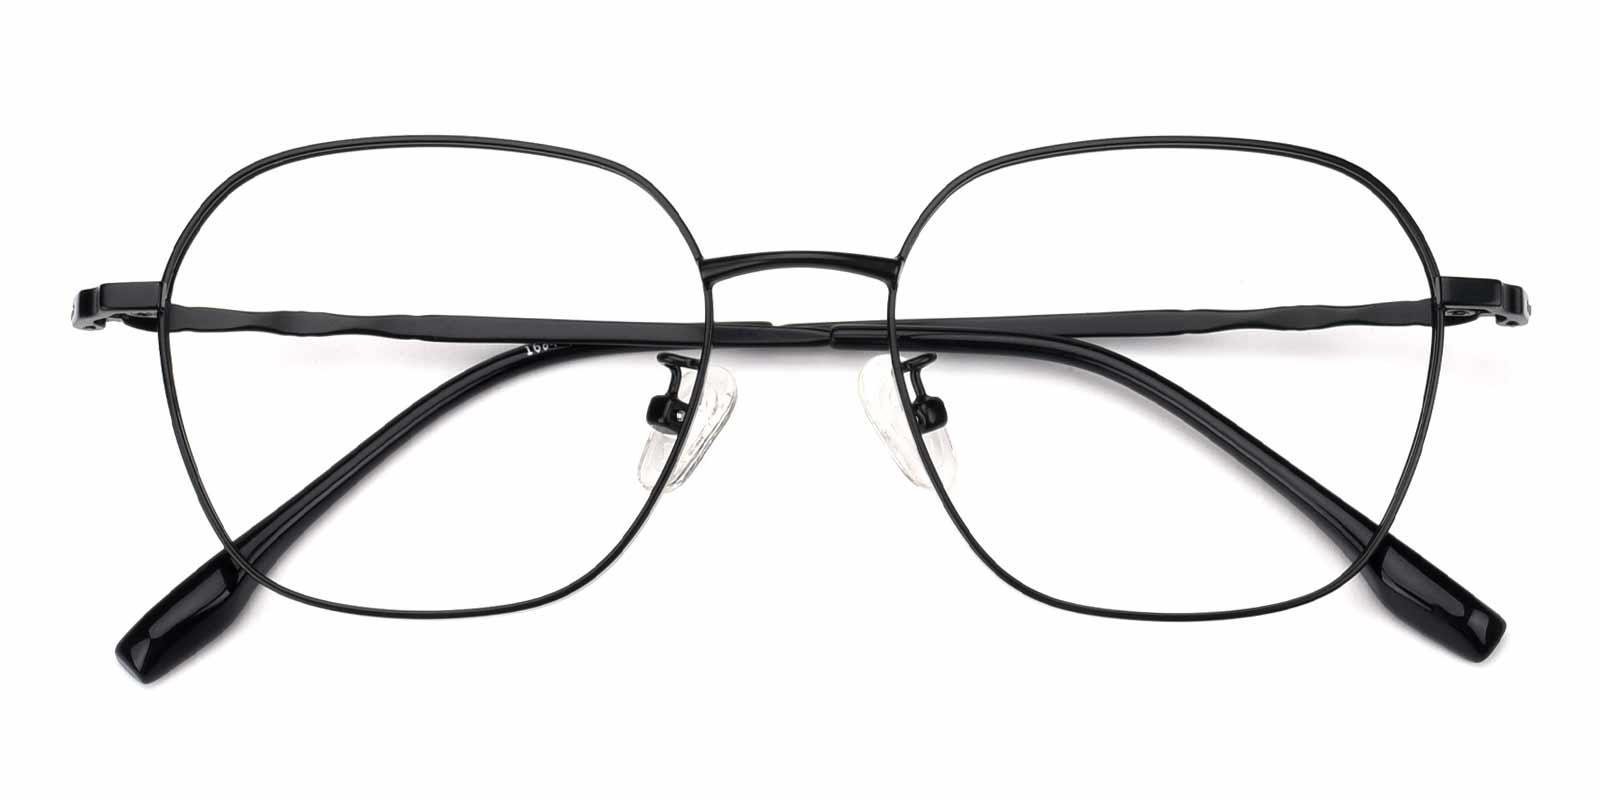 Aidan-Black-Square-Metal-Eyeglasses-detail